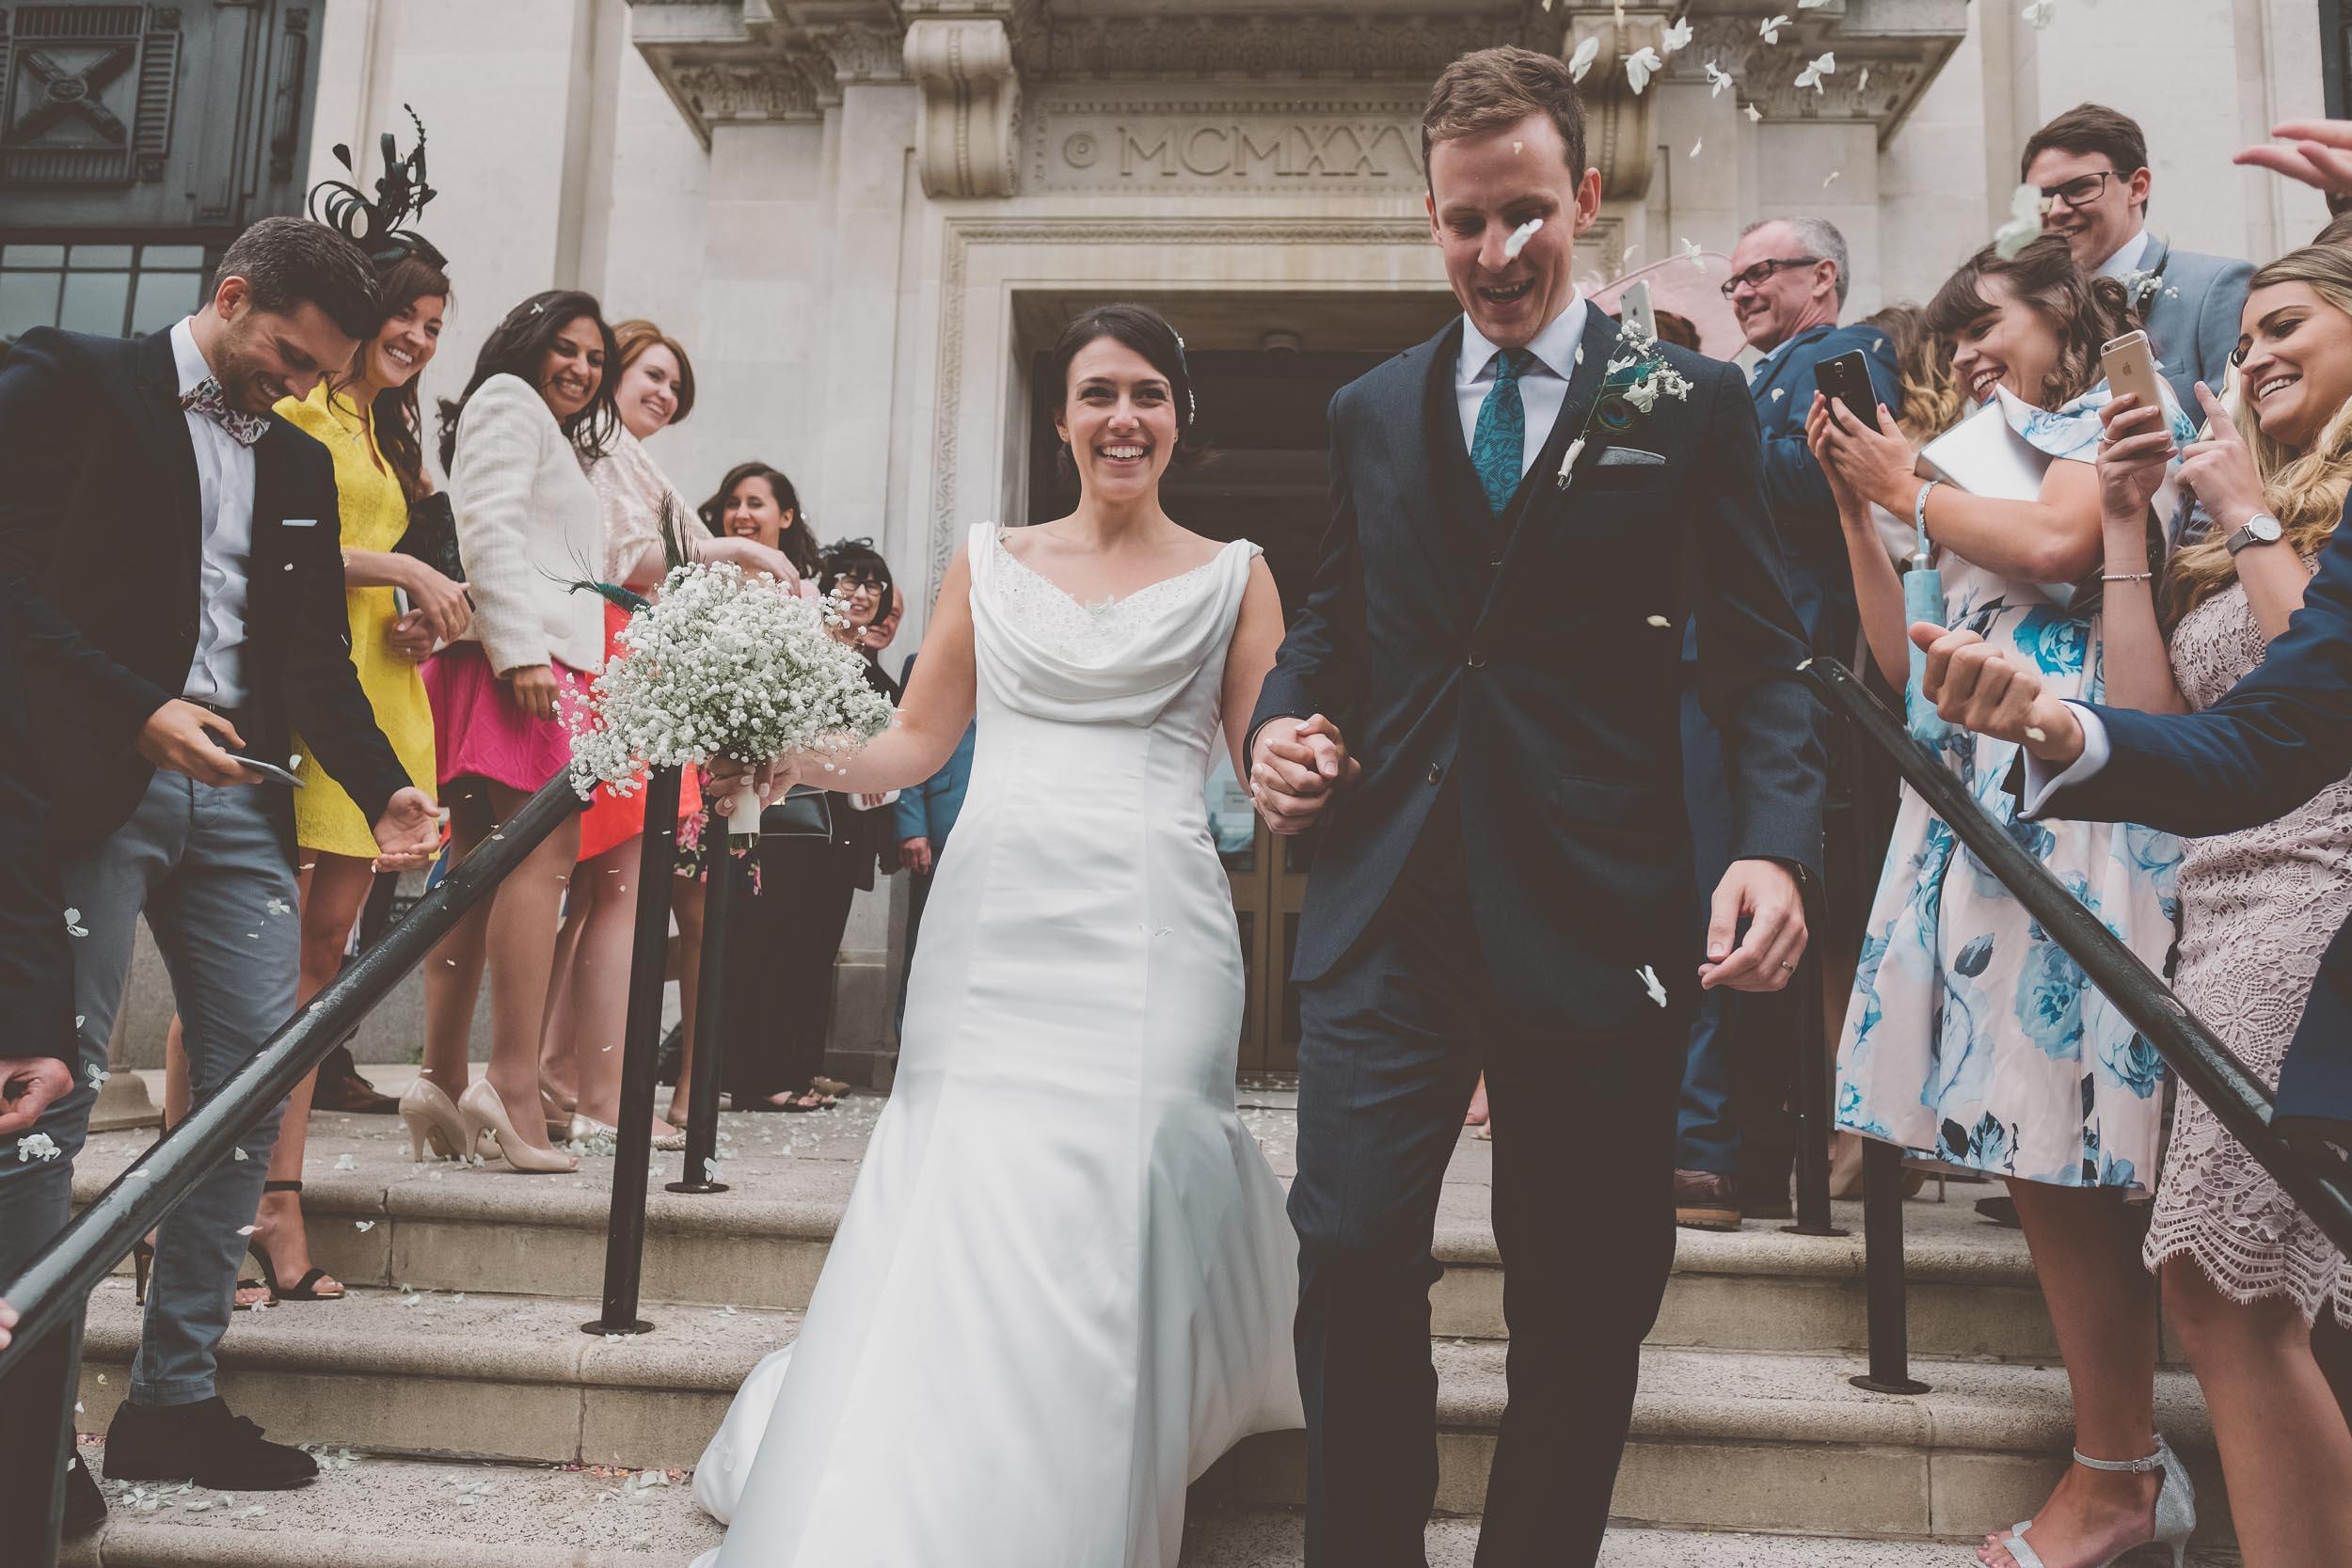 islington-town-hall-4th-floor-studios-wedding153.jpg